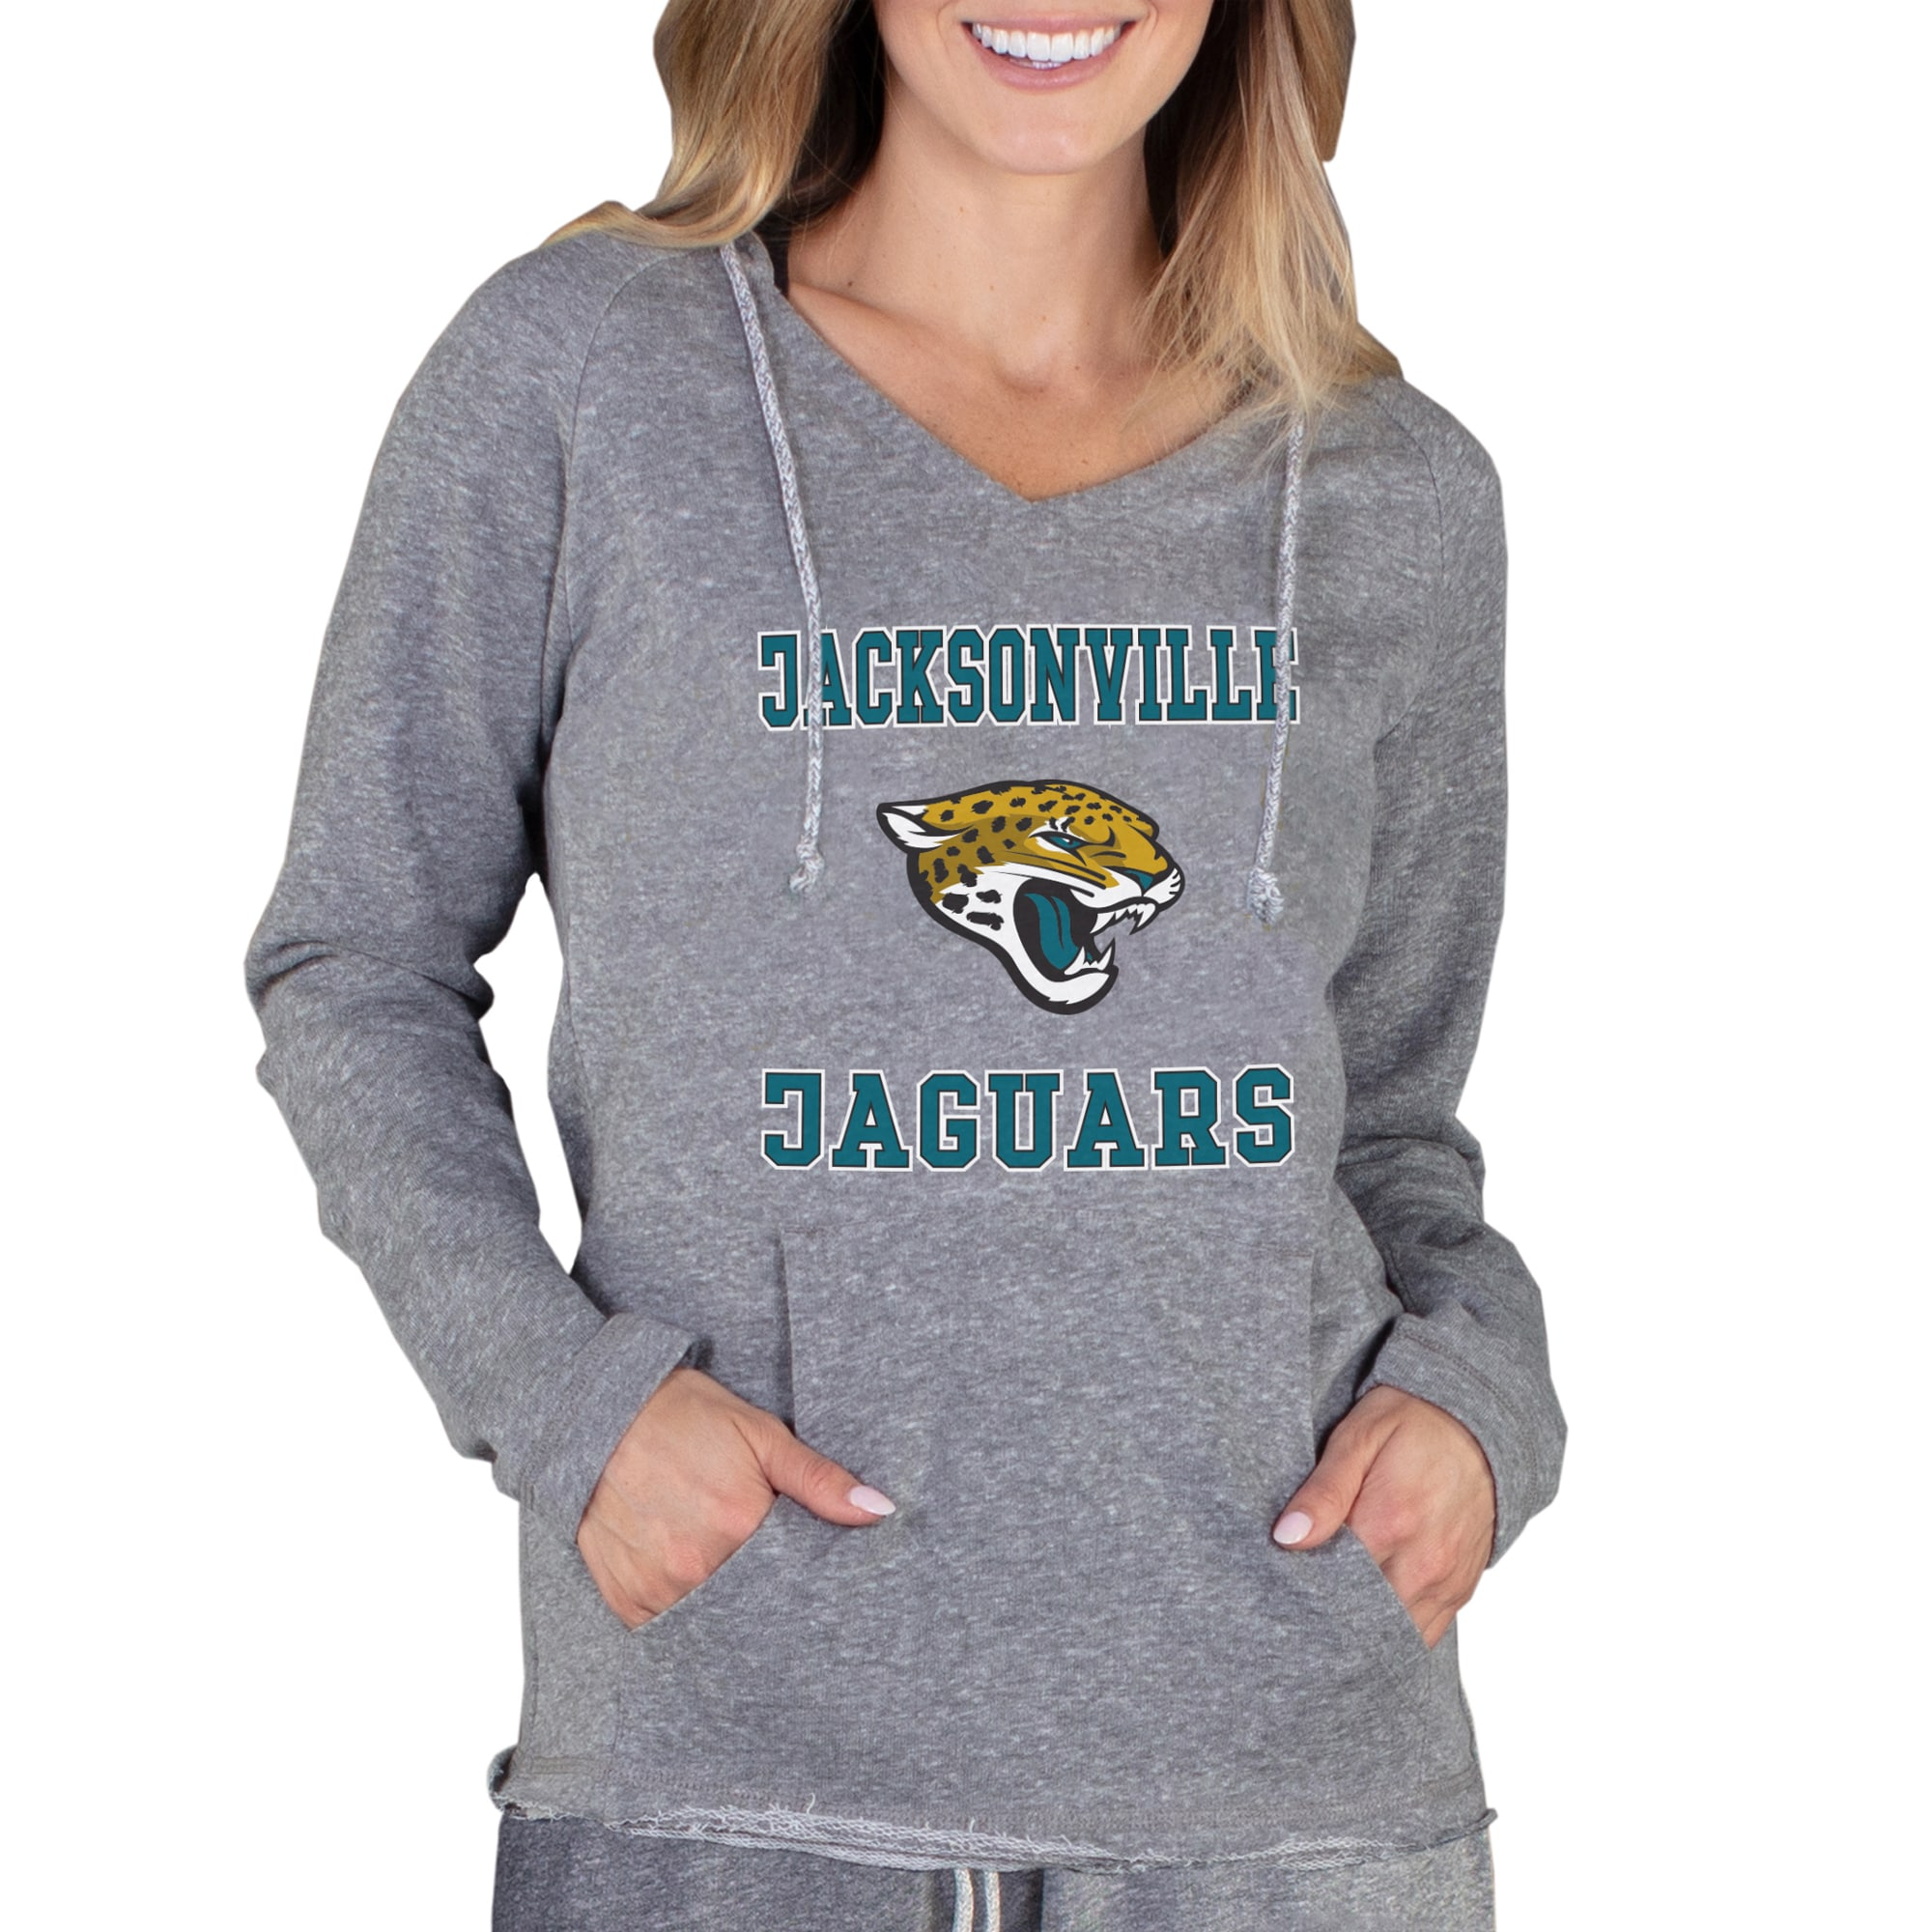 Jacksonville Jaguars Concepts Sport Women's Mainstream Hooded Long Sleeve V-Neck Top - Gray